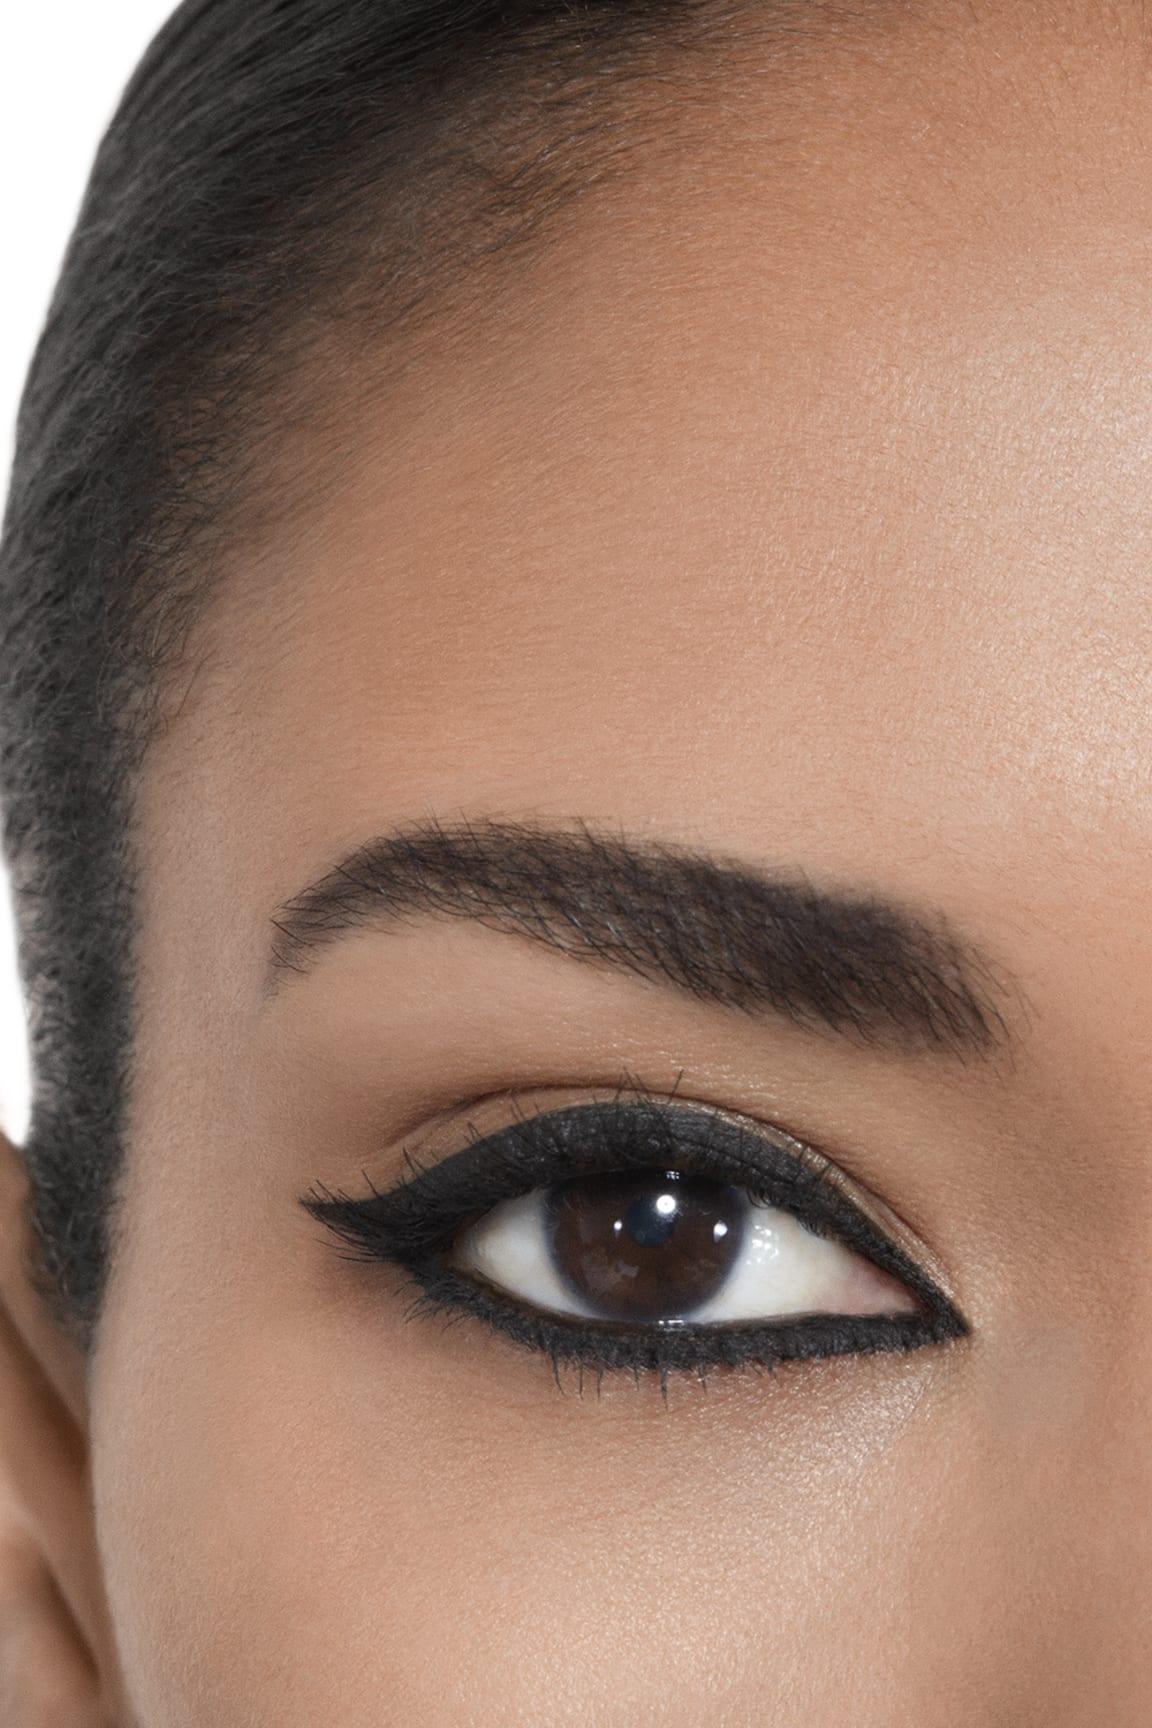 Application makeup visual 2 - CALLIGRAPHIE DE CHANEL 65 - HYPERBLACK